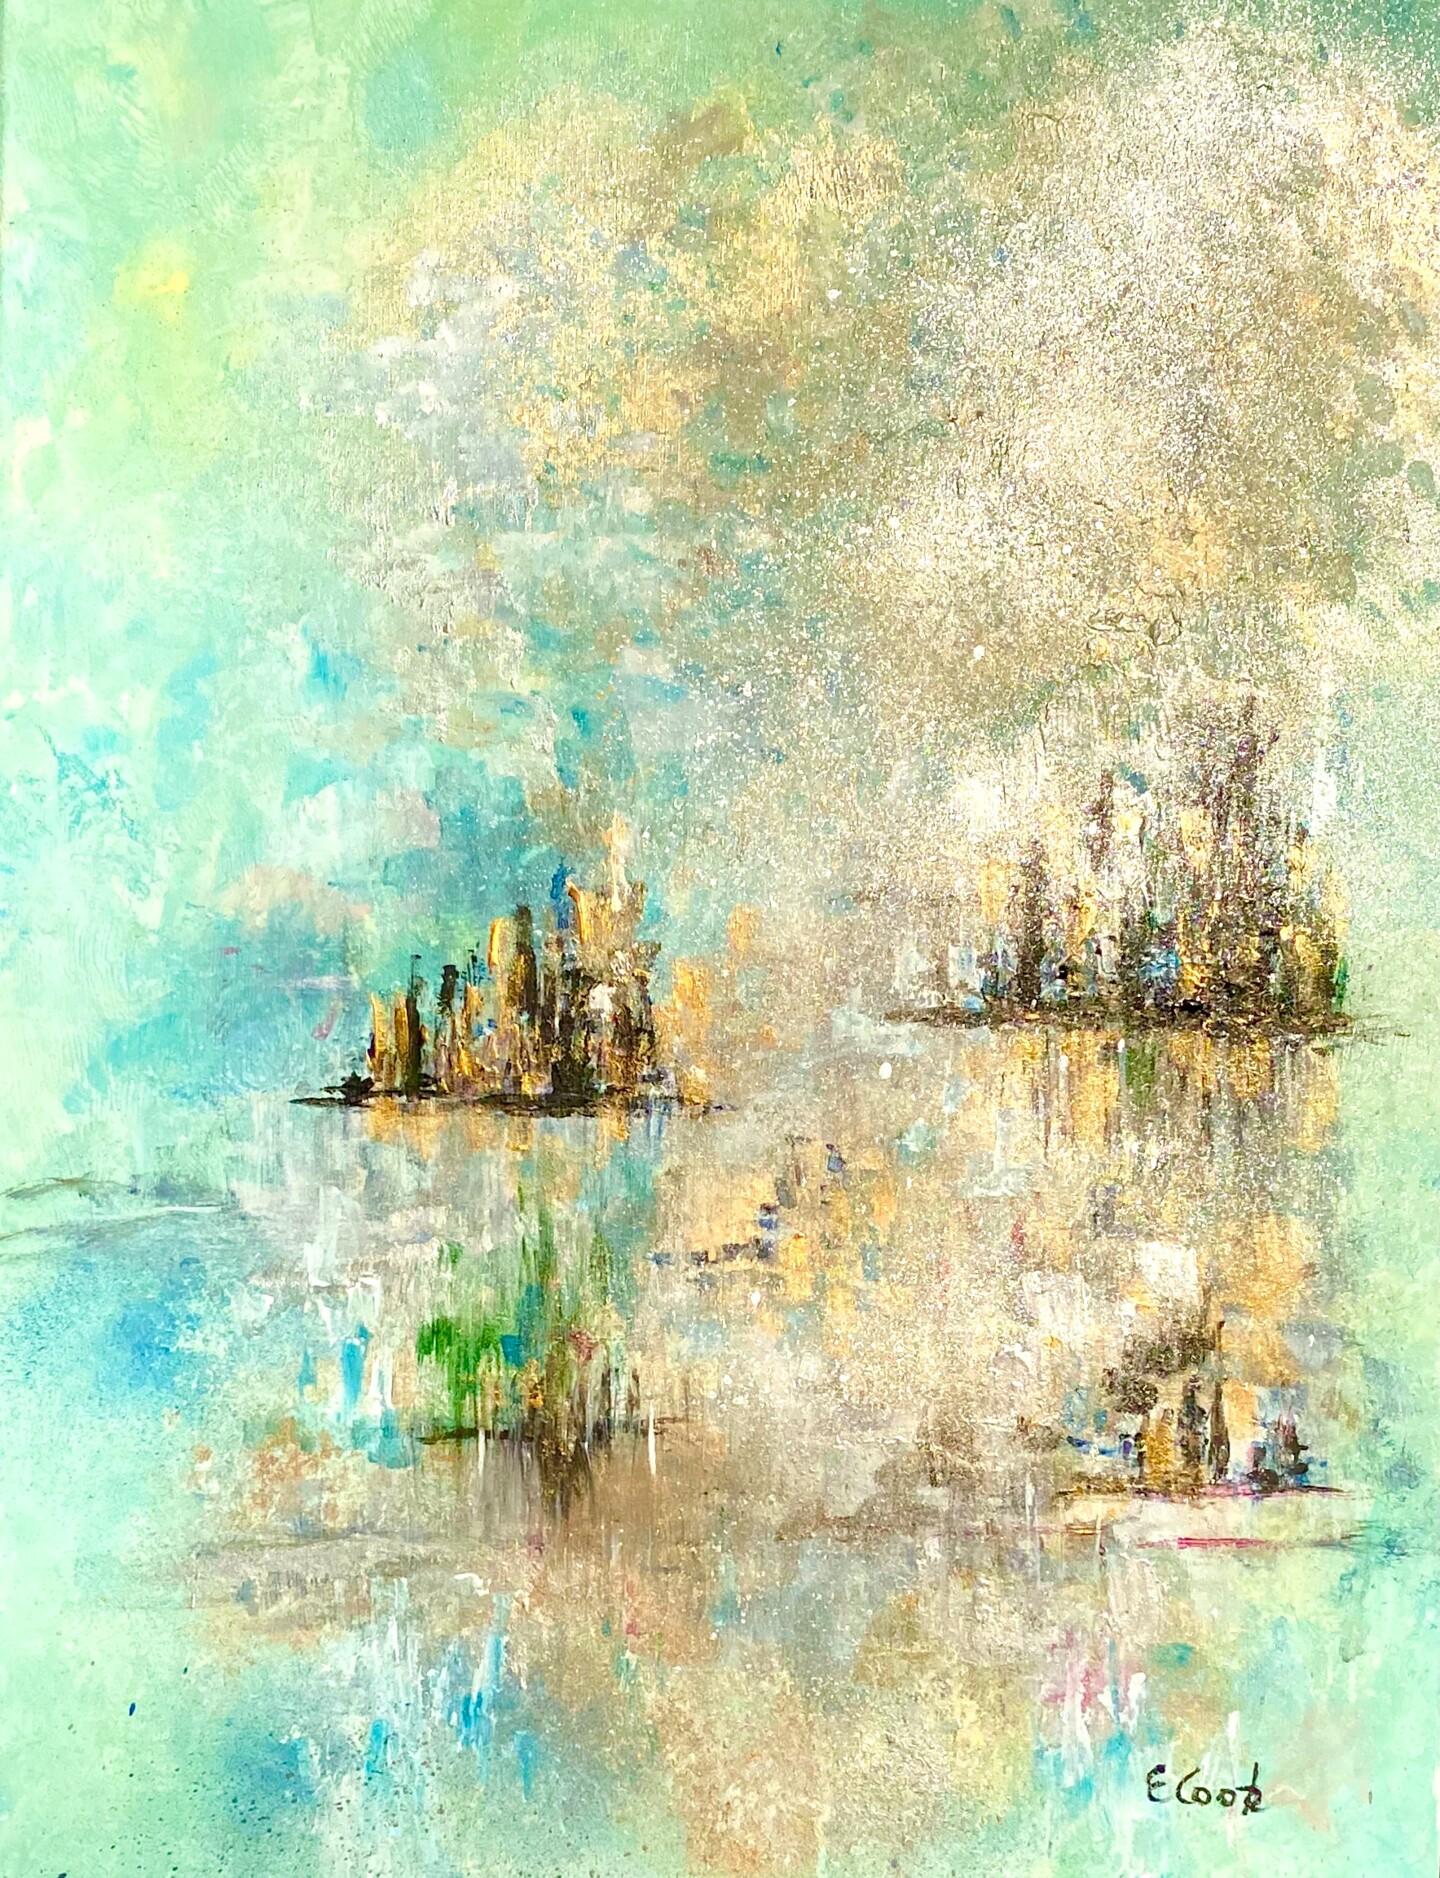 Elisa Cook - Journey into my Inner Light